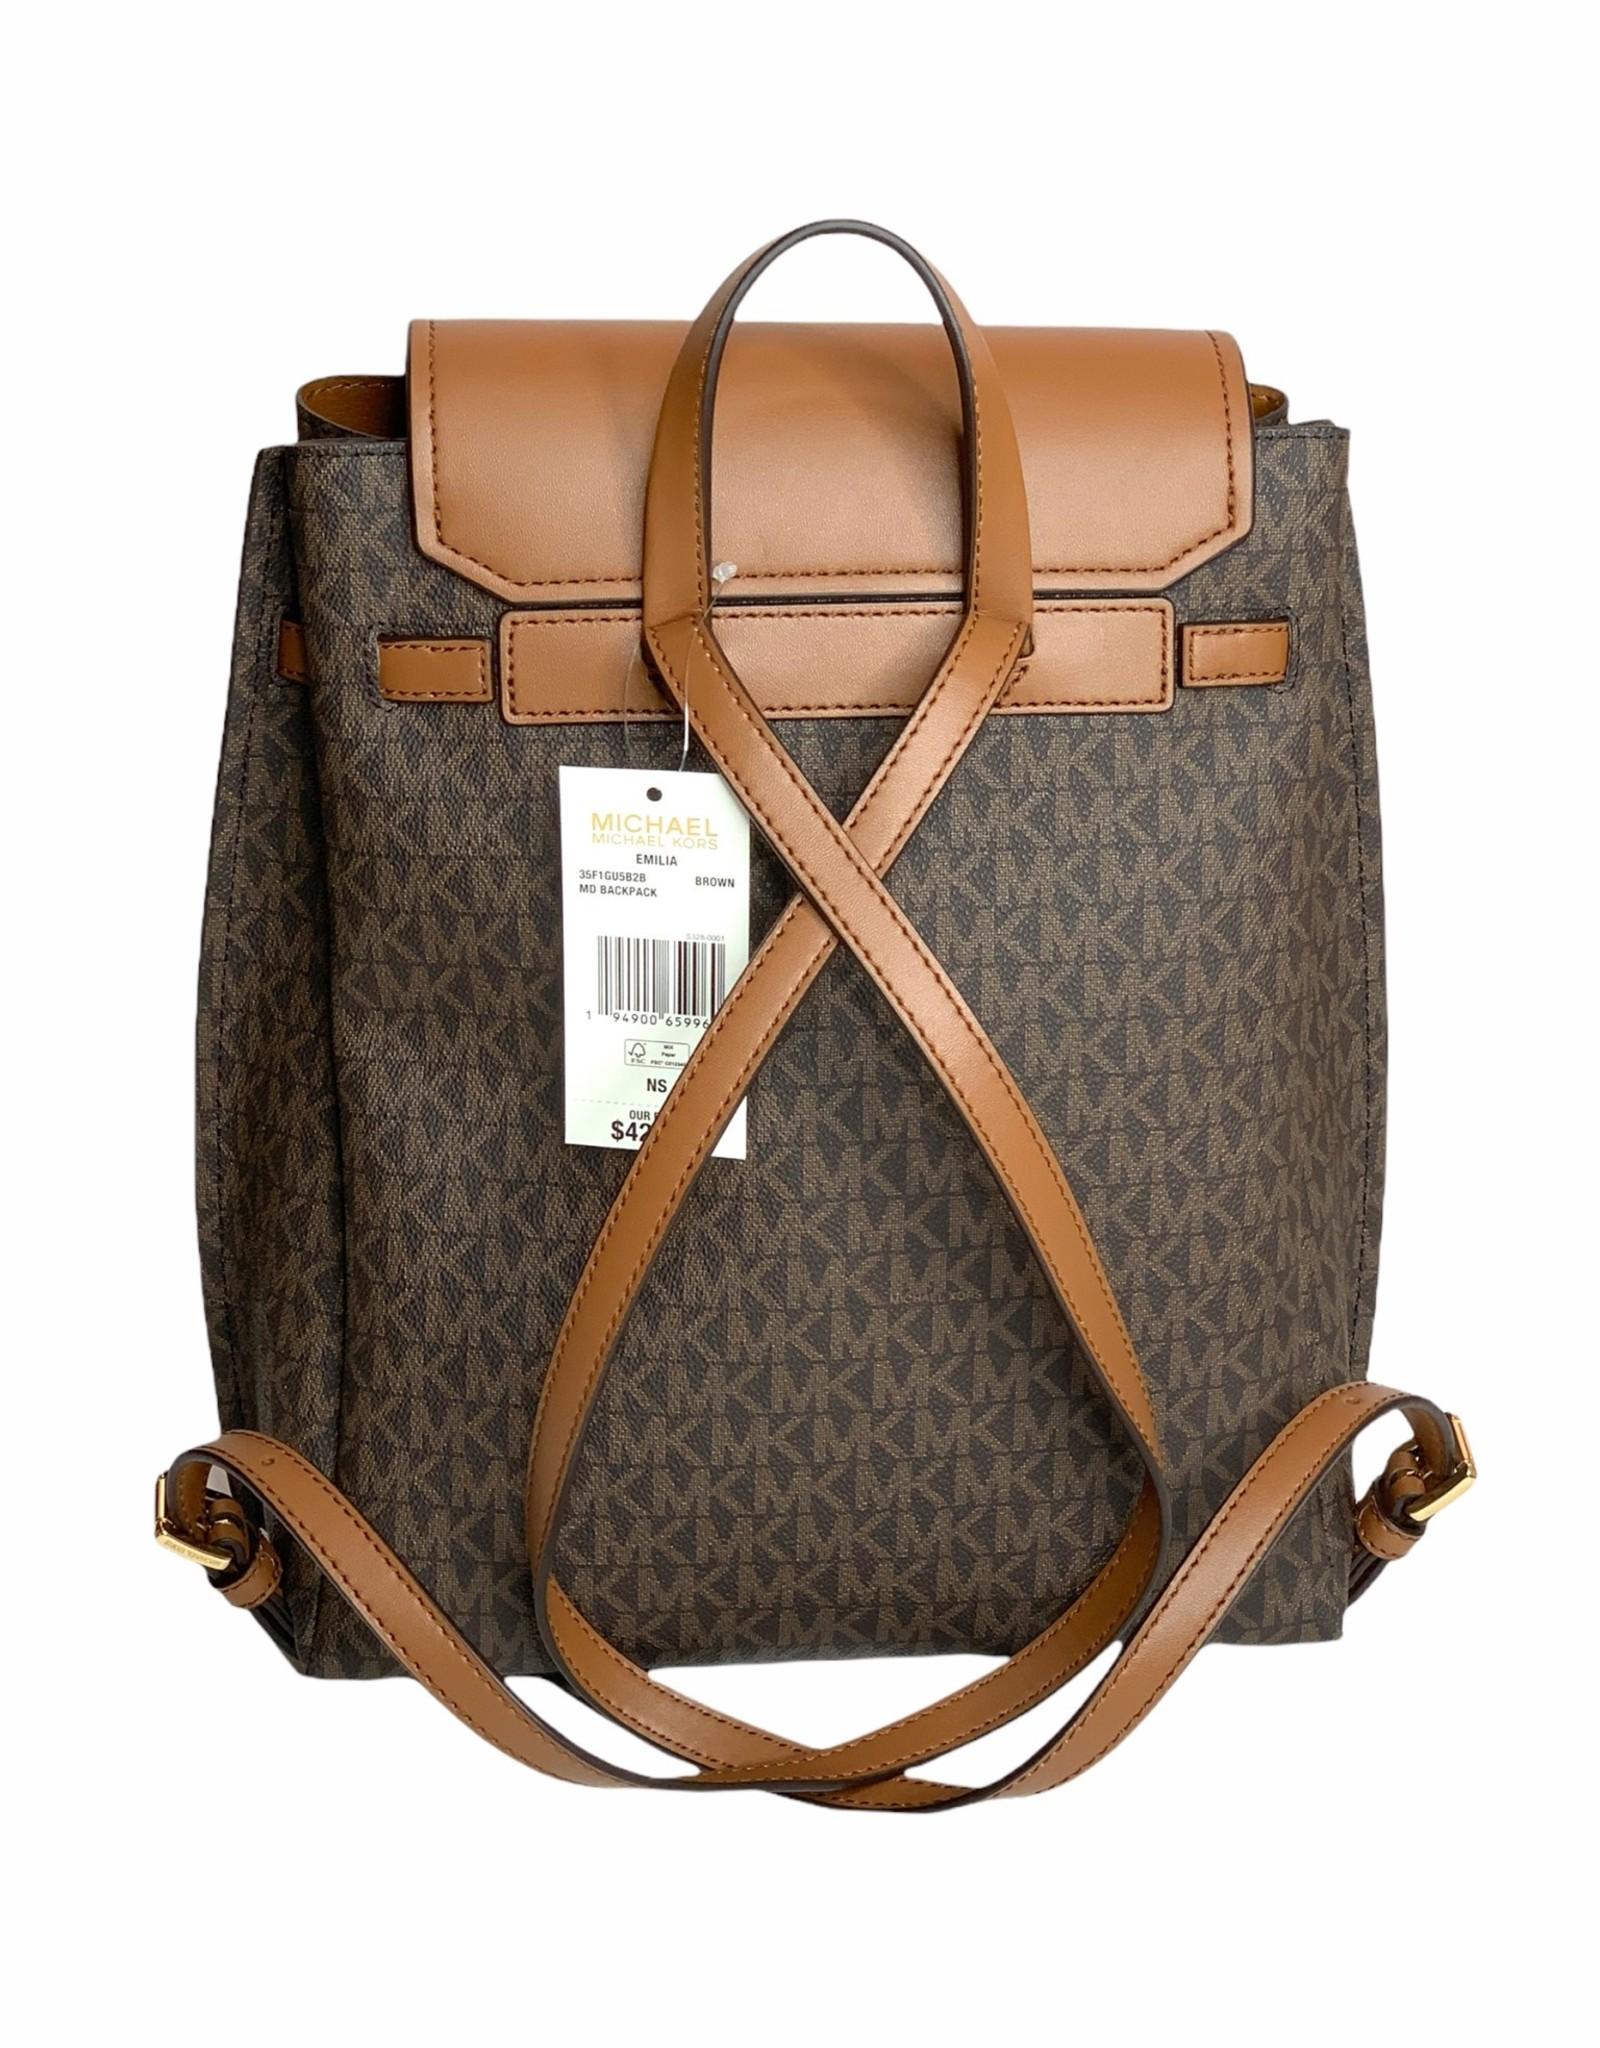 Michael Kors Michael Kors Emilia MD Backpack